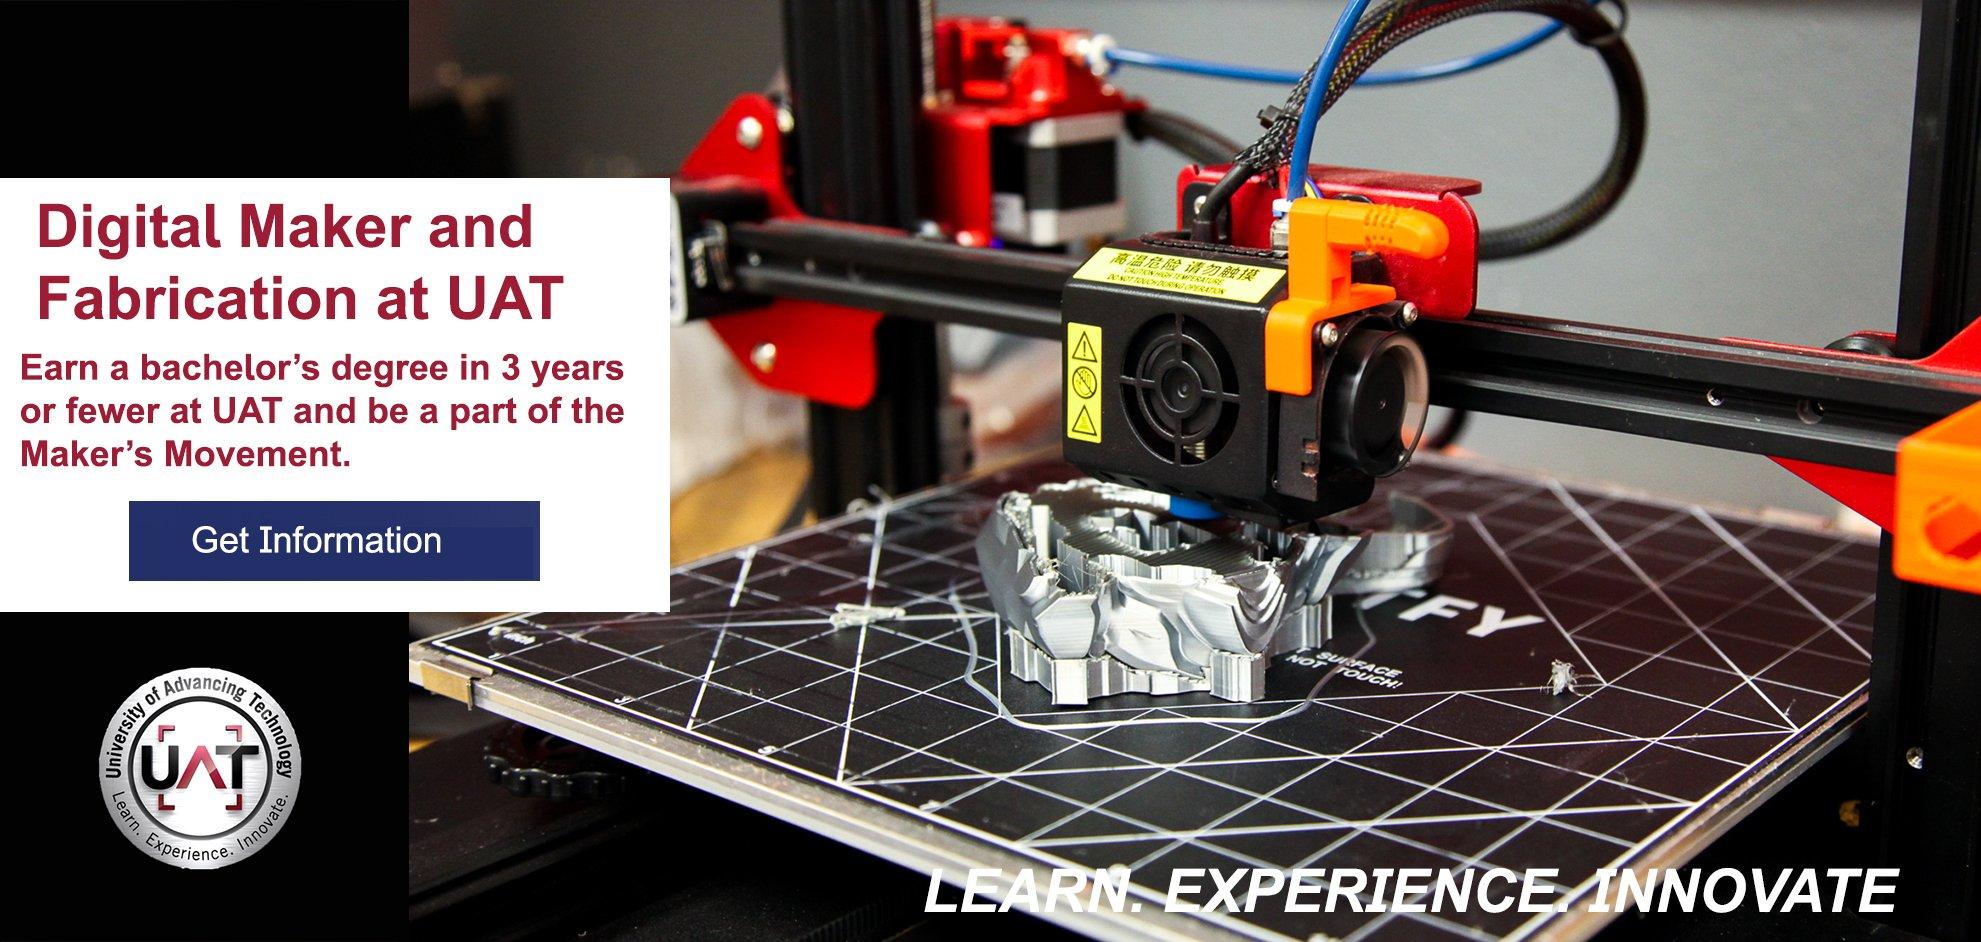 Digital Maker Degree at University of Advancing Technology